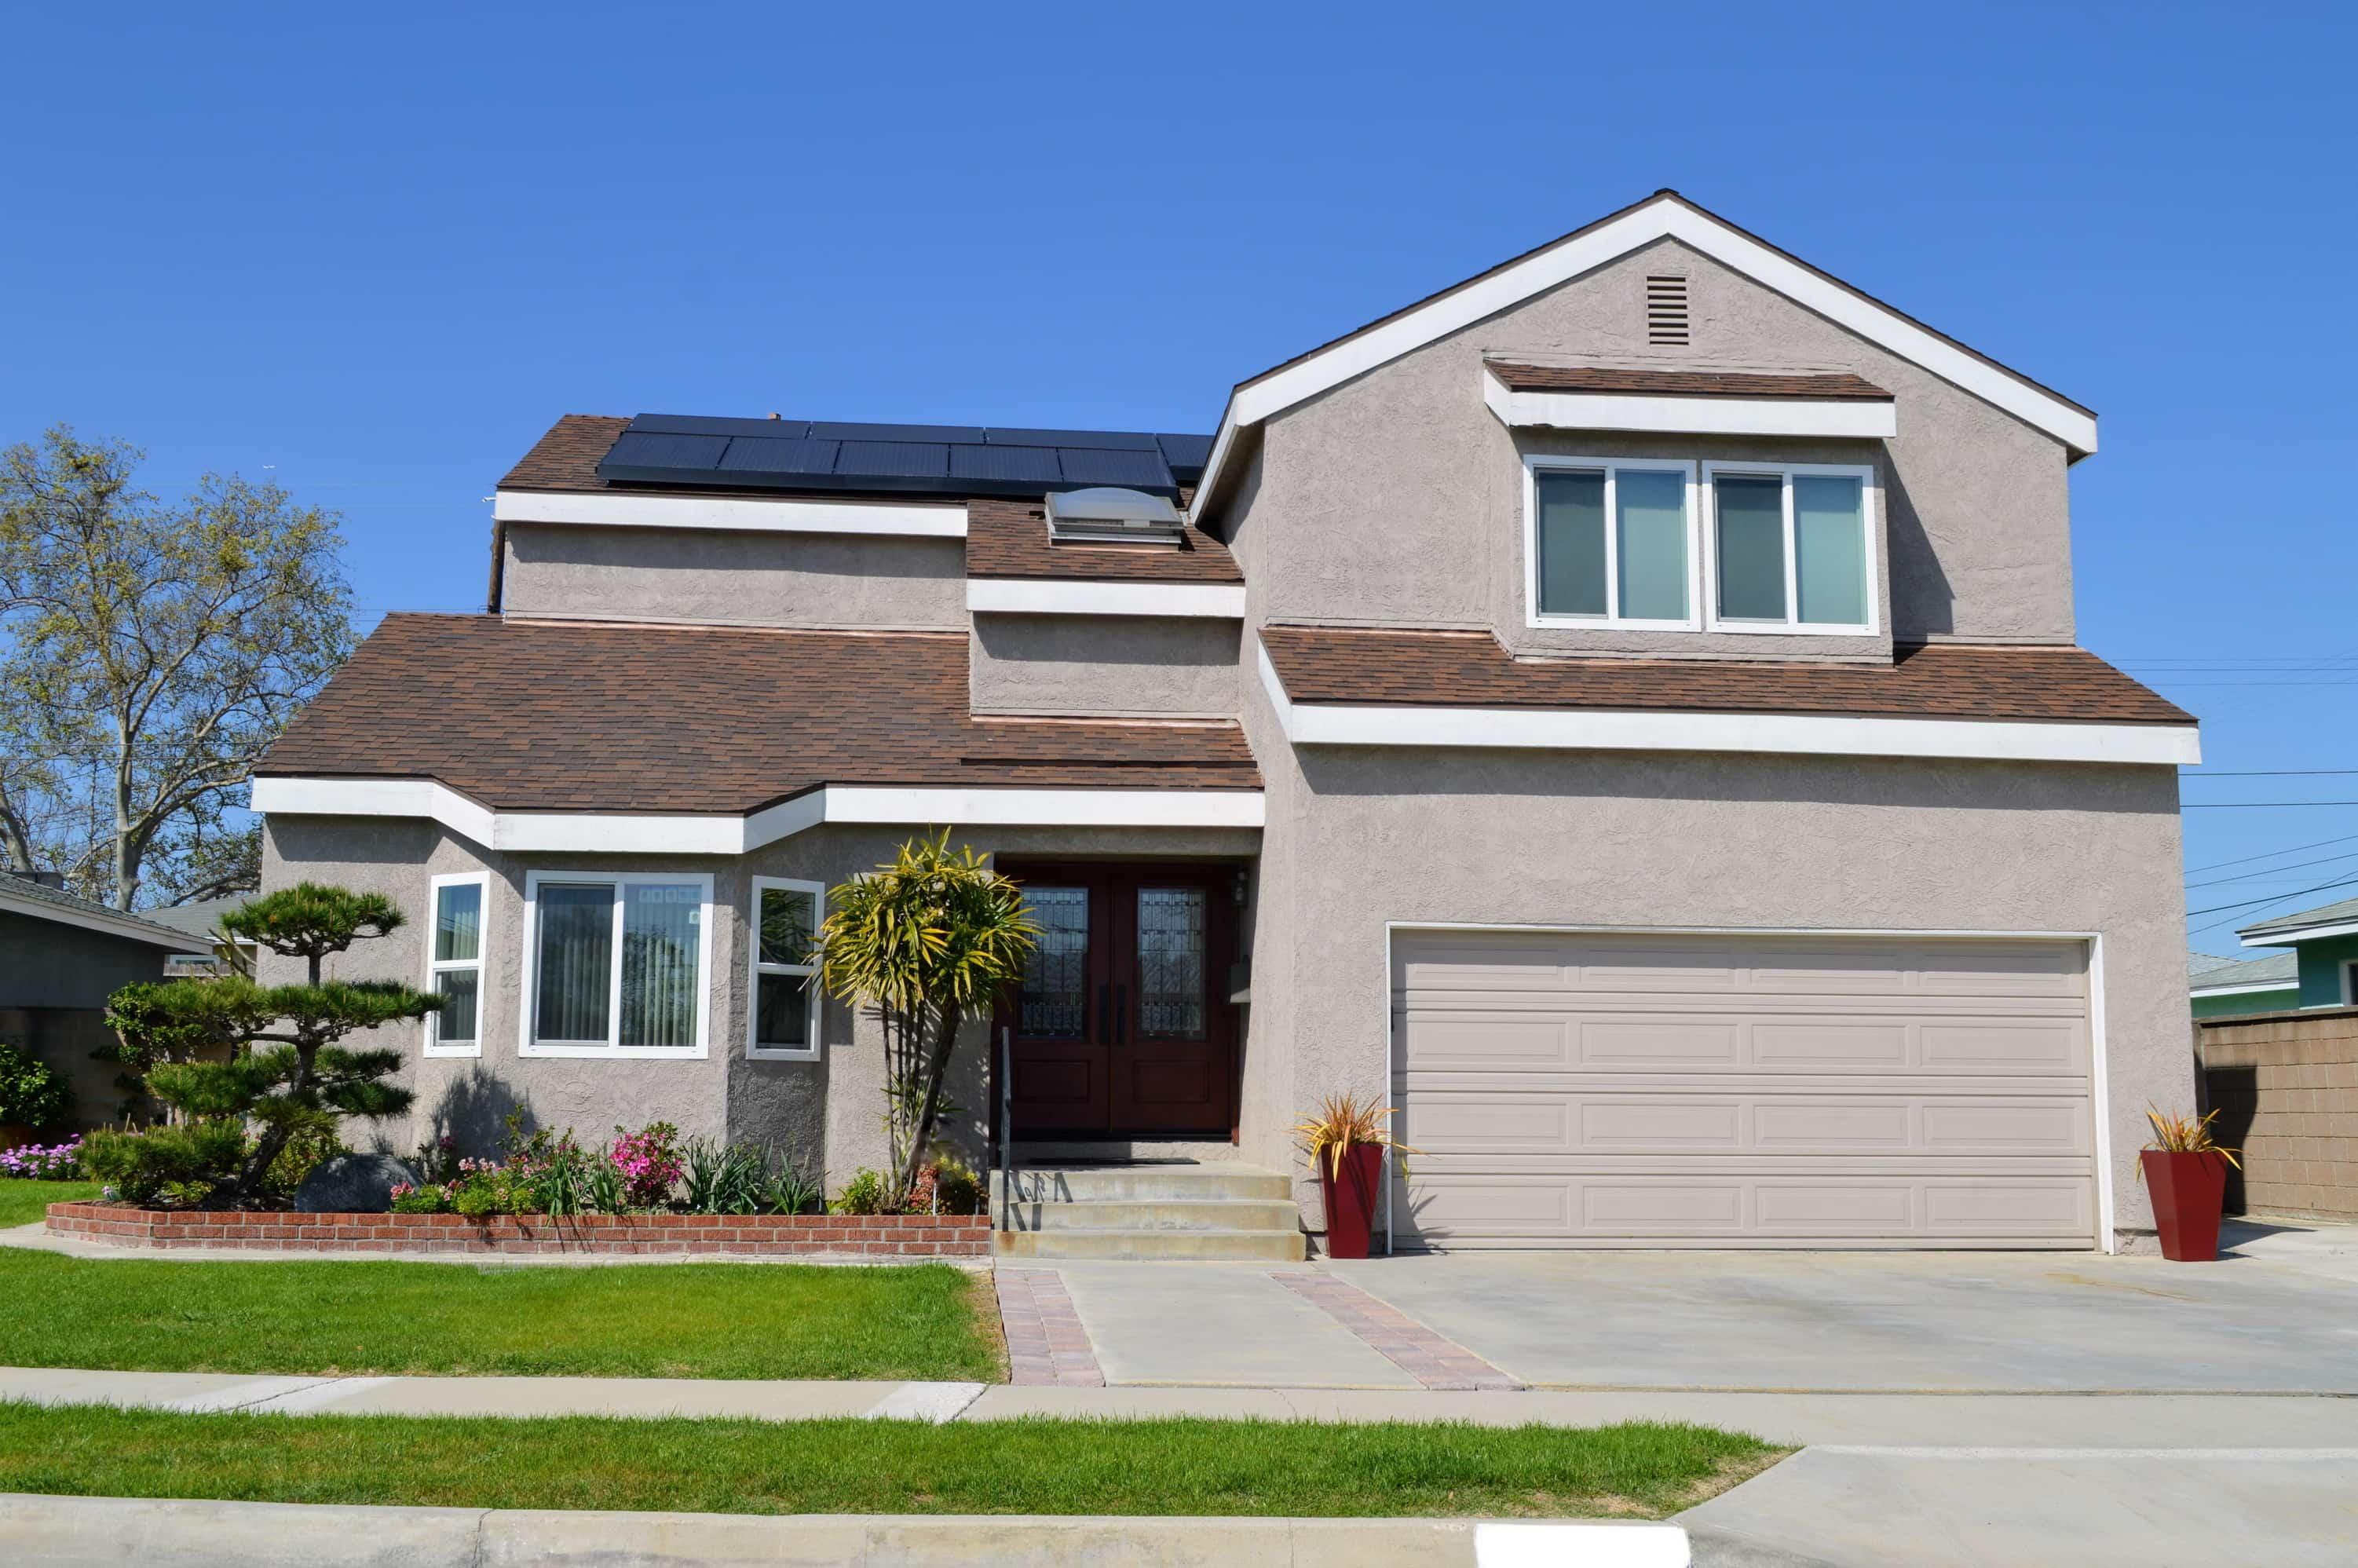 solar financing explained